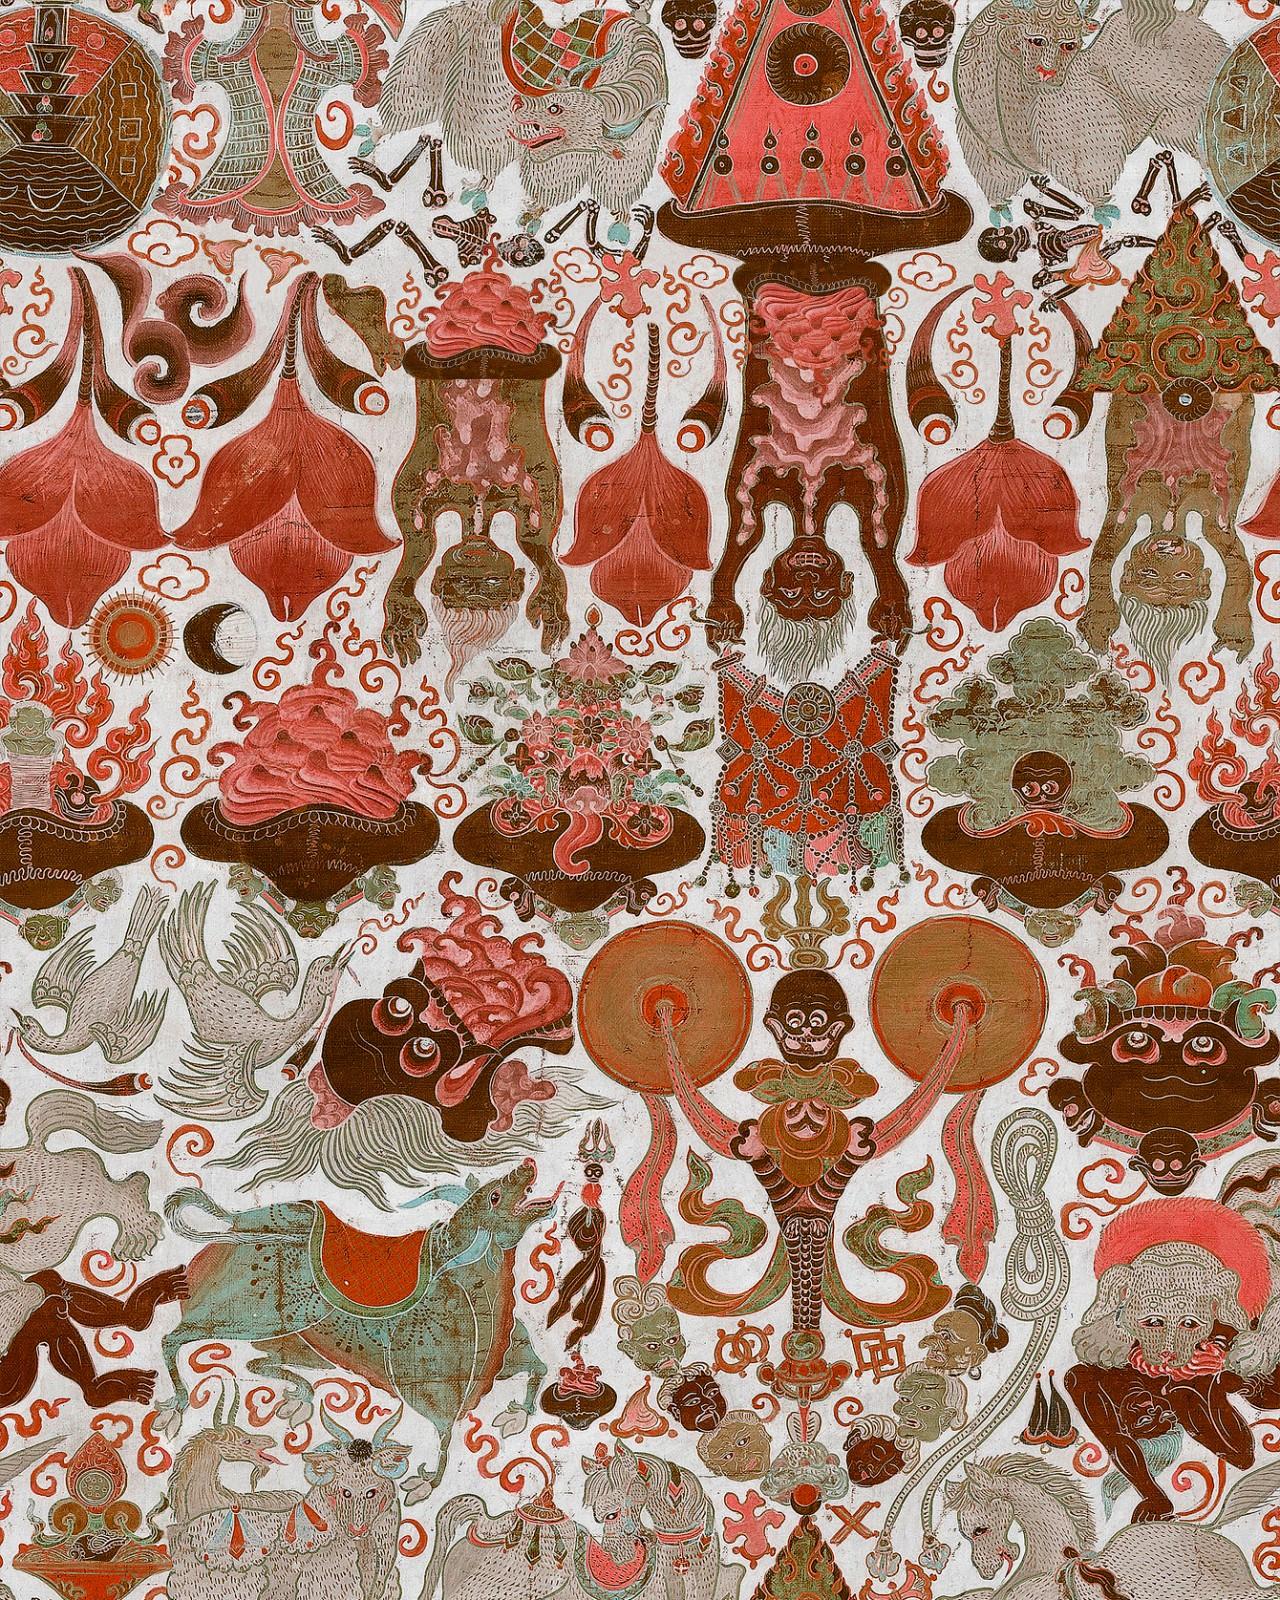 YAMA DHARMARAJA Light Wallpaper